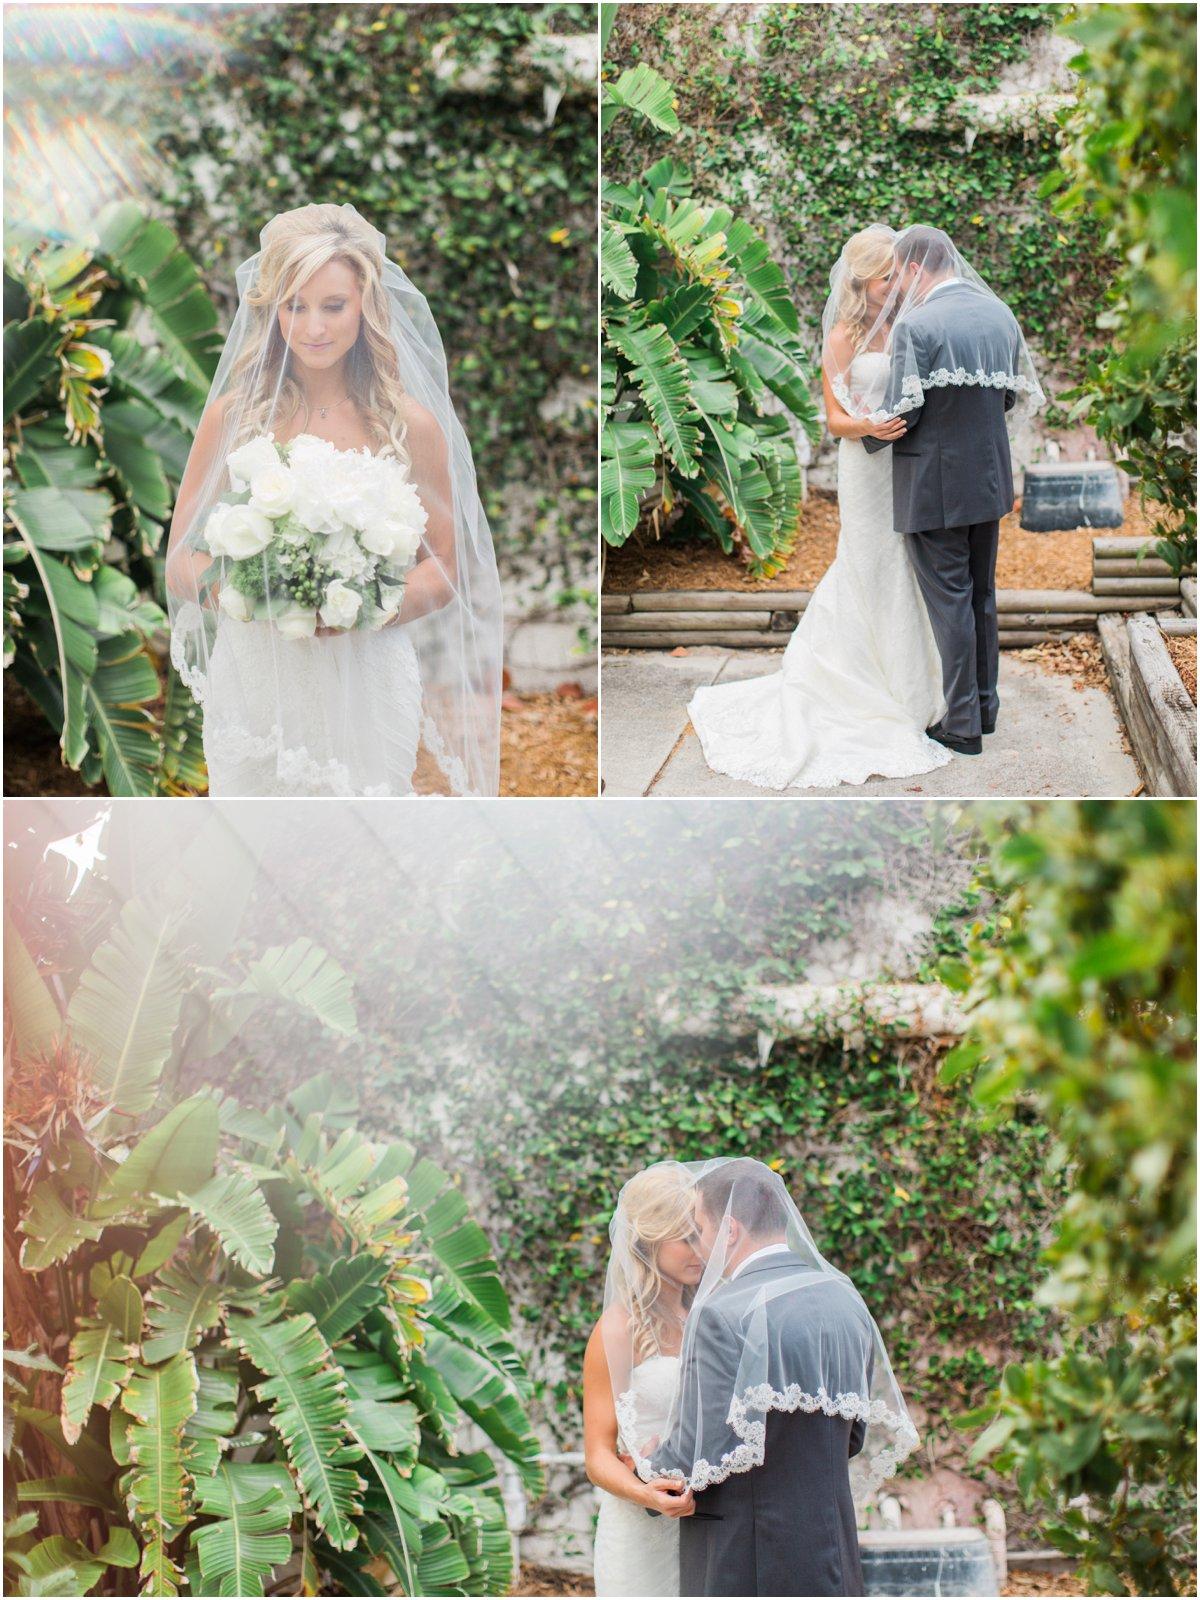 South-Florida-Wedding-Photographer-Hillsboro-lighthouse_0021